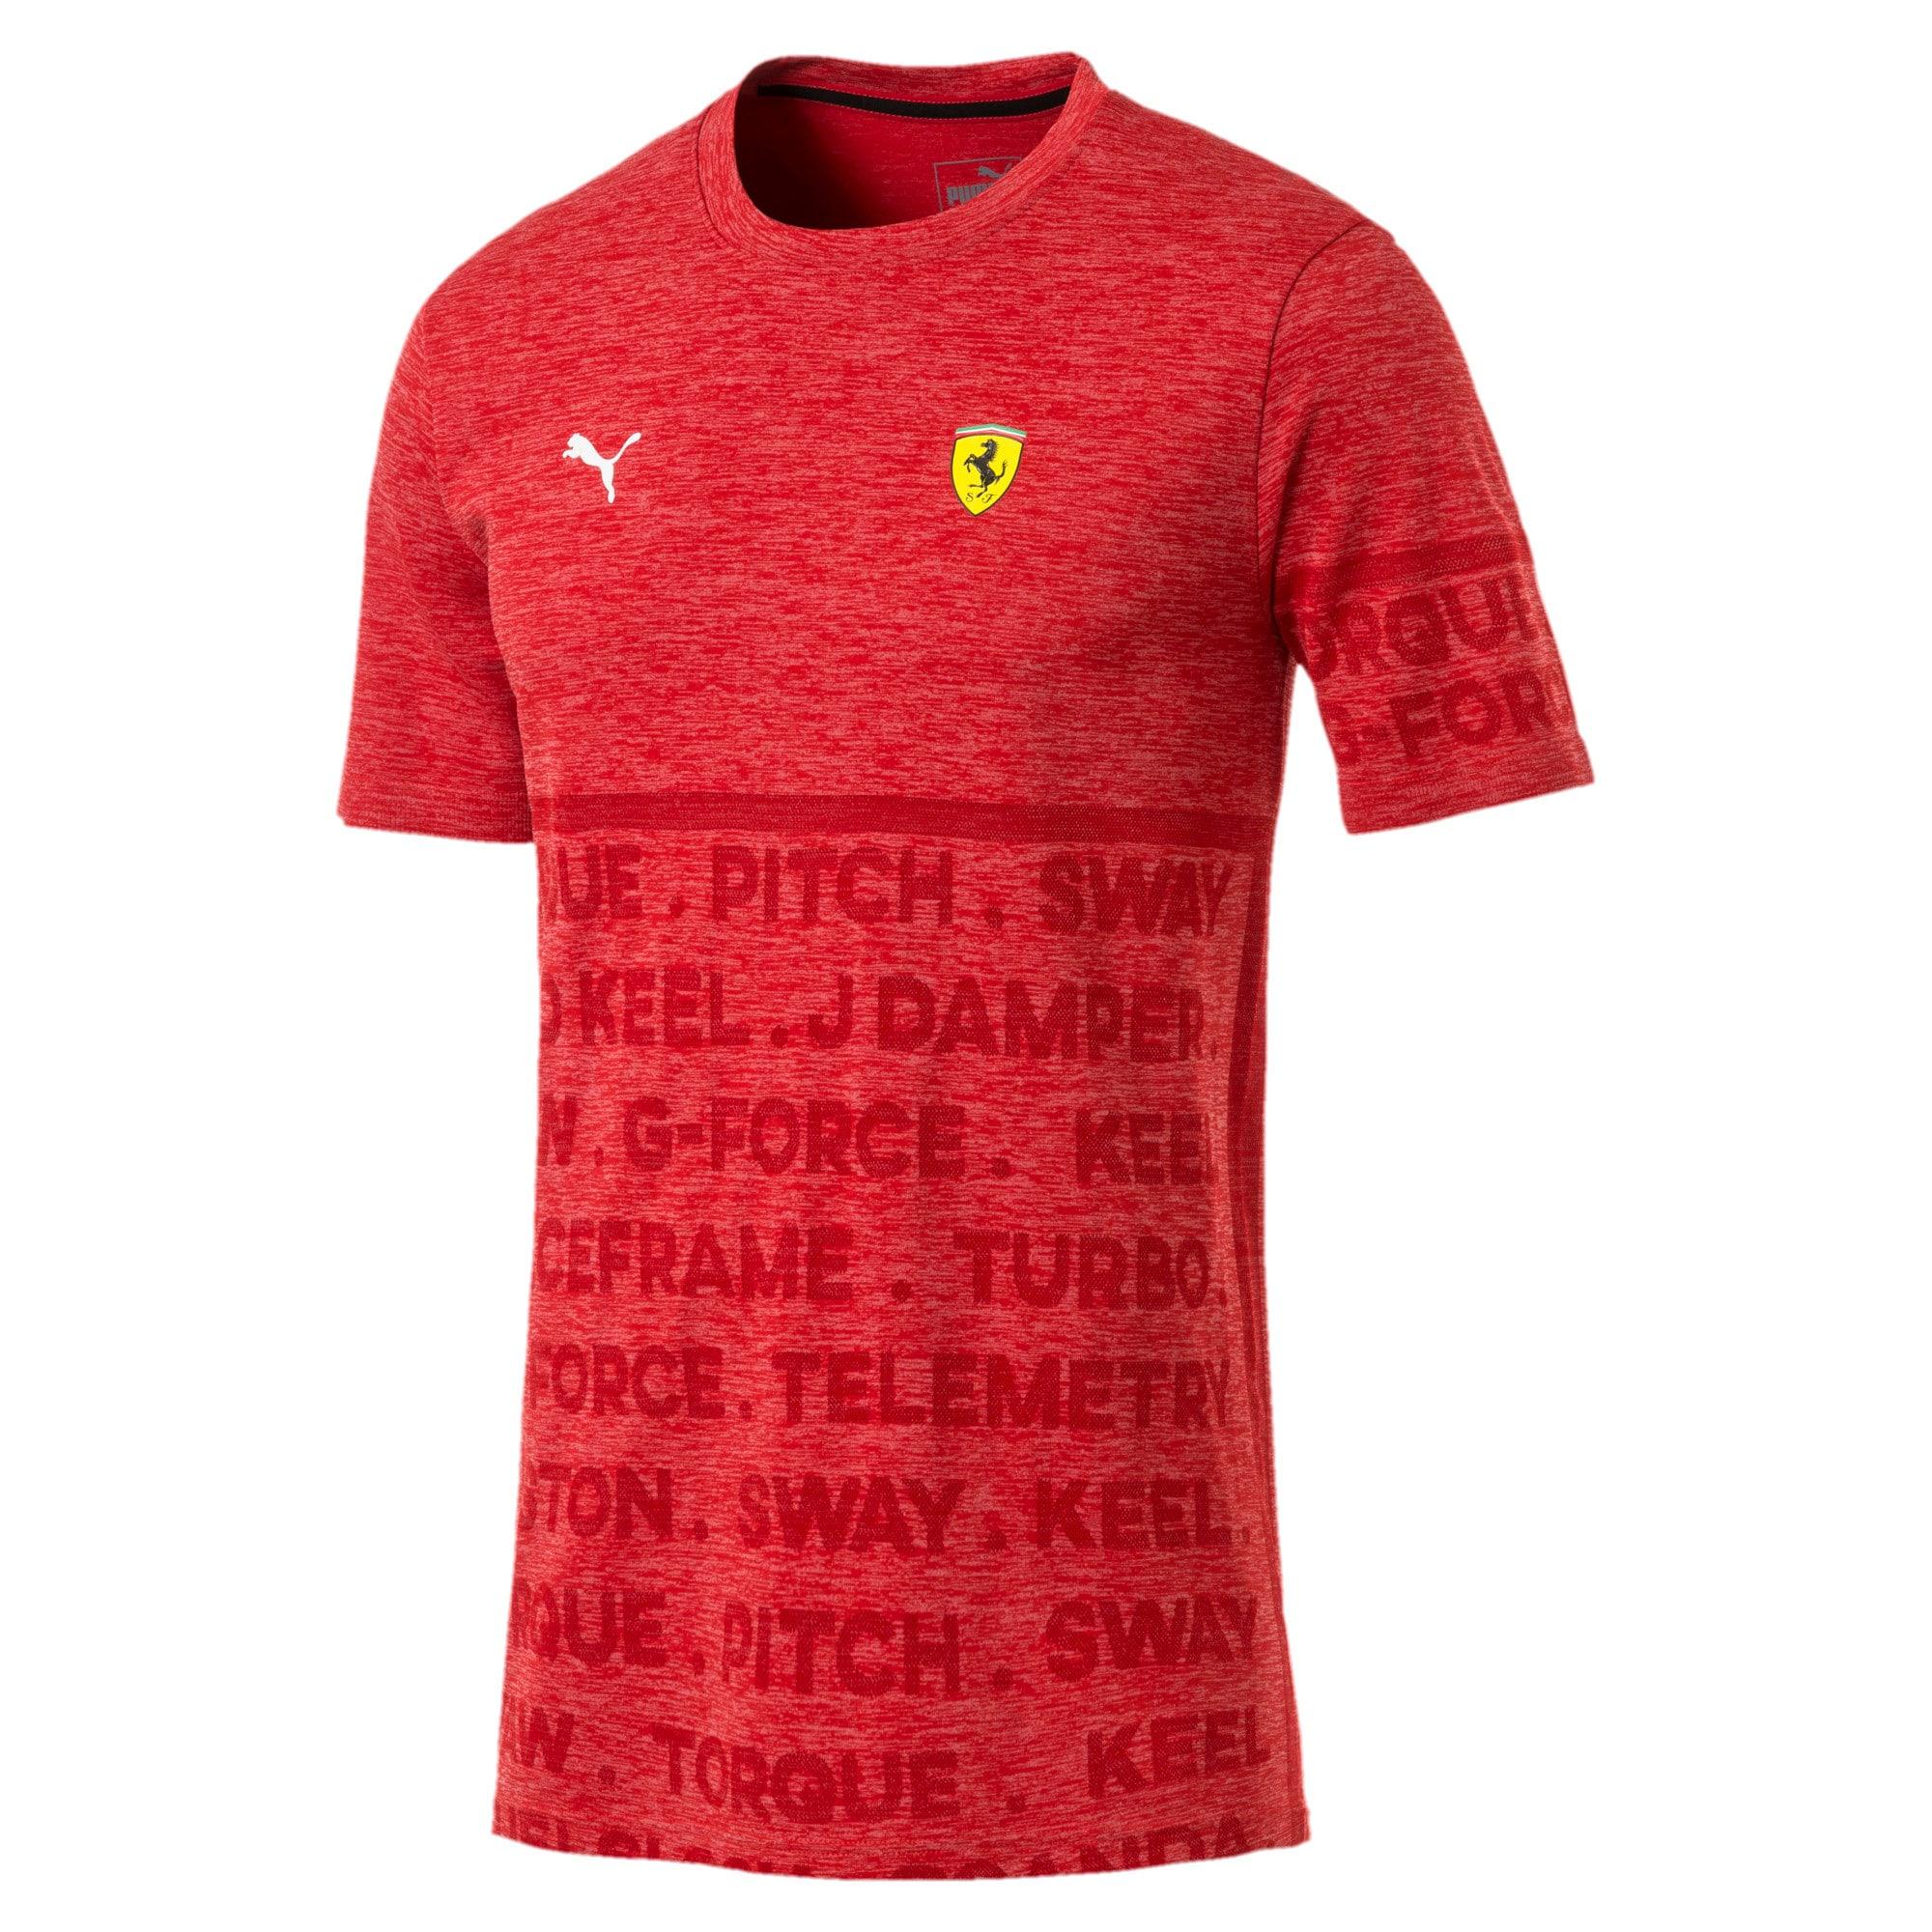 Thumbnail 4 of Ferrari evoKNIT Short Sleeve Men's Tee, Rosso Corsa, medium-IND